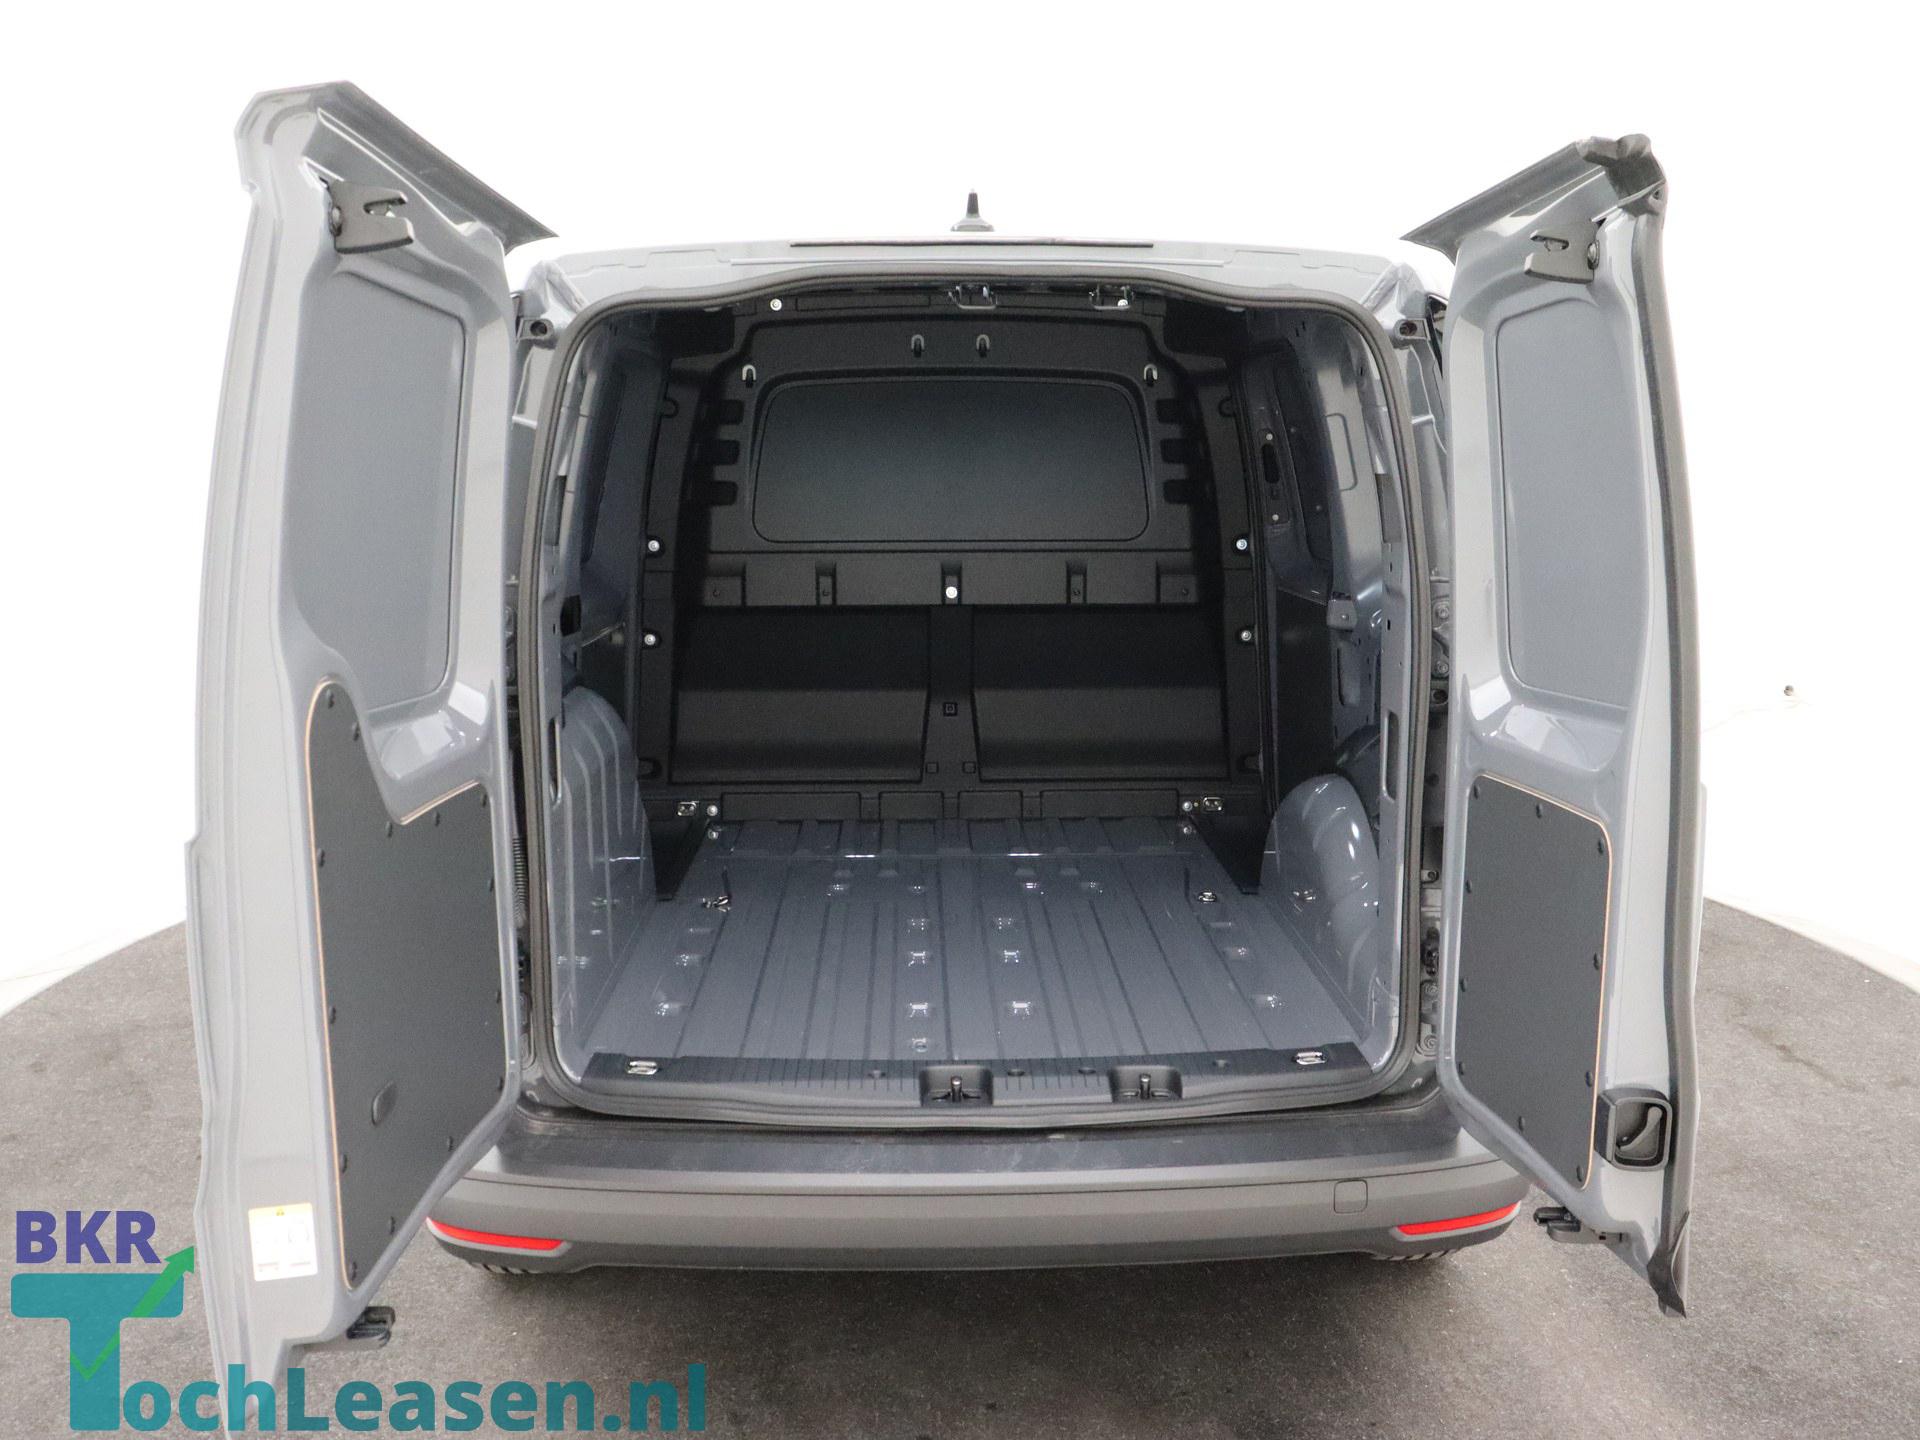 BKR toch leasen - Volkswagen Caddy - Grijs 16